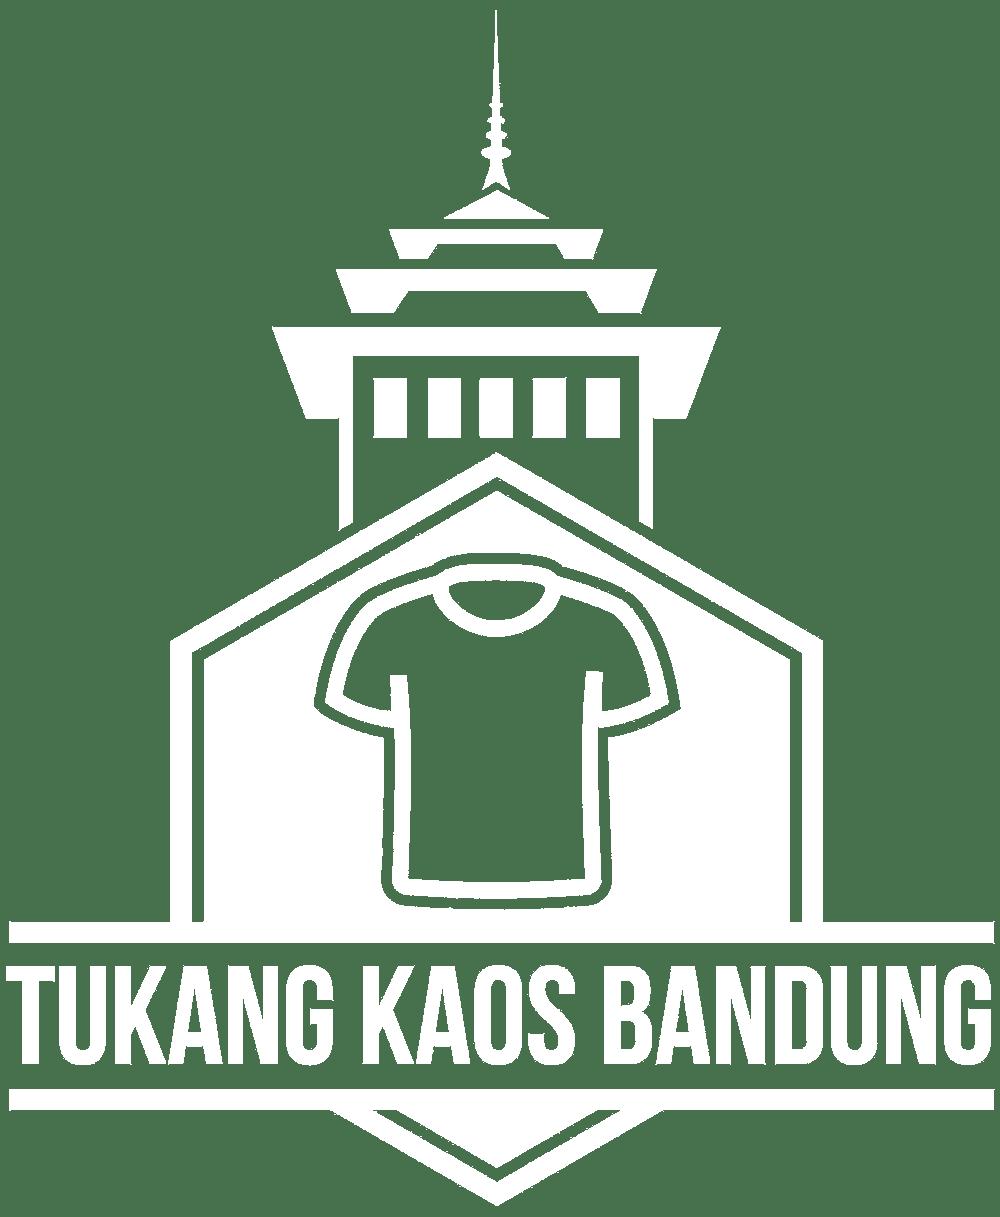 tukangkaosbandung.com